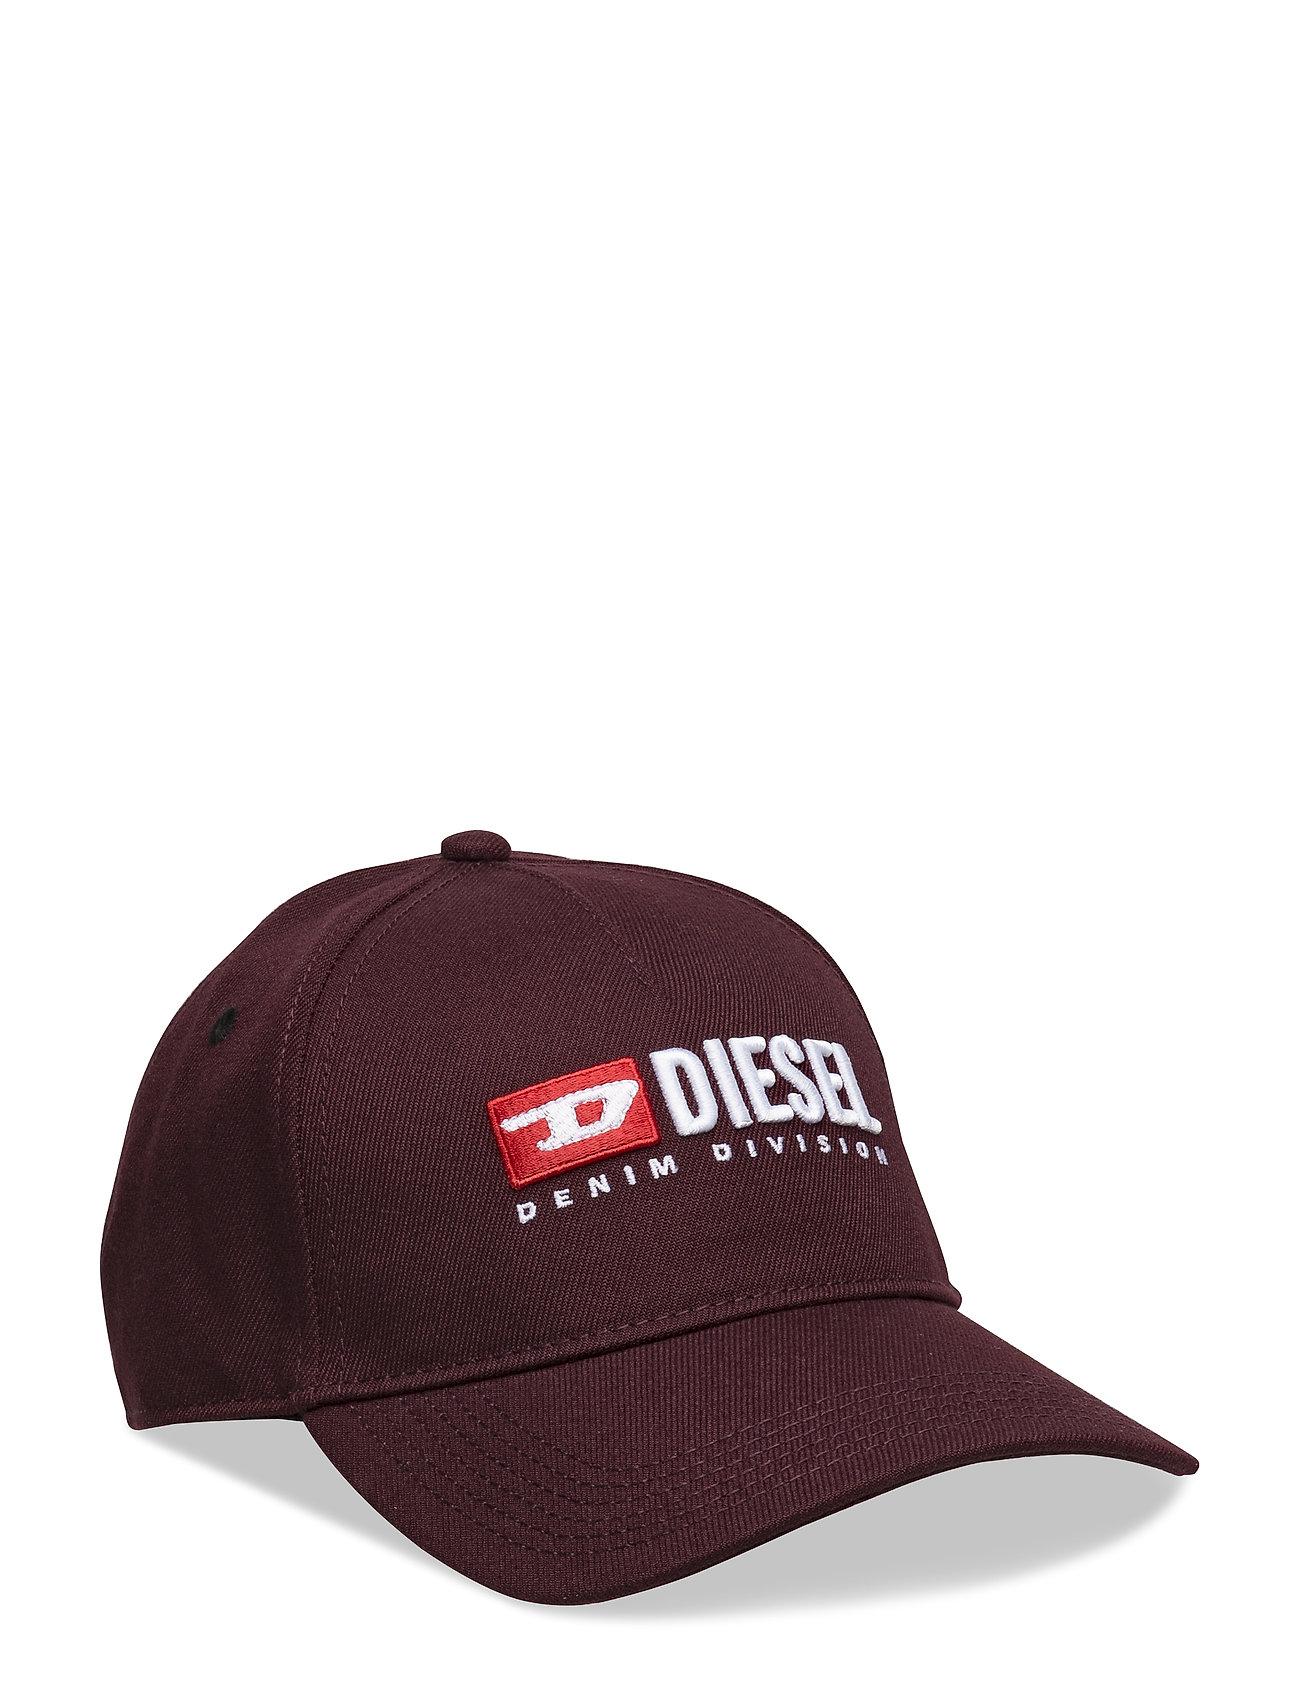 Cakerym-Max Hat - Diesel Men